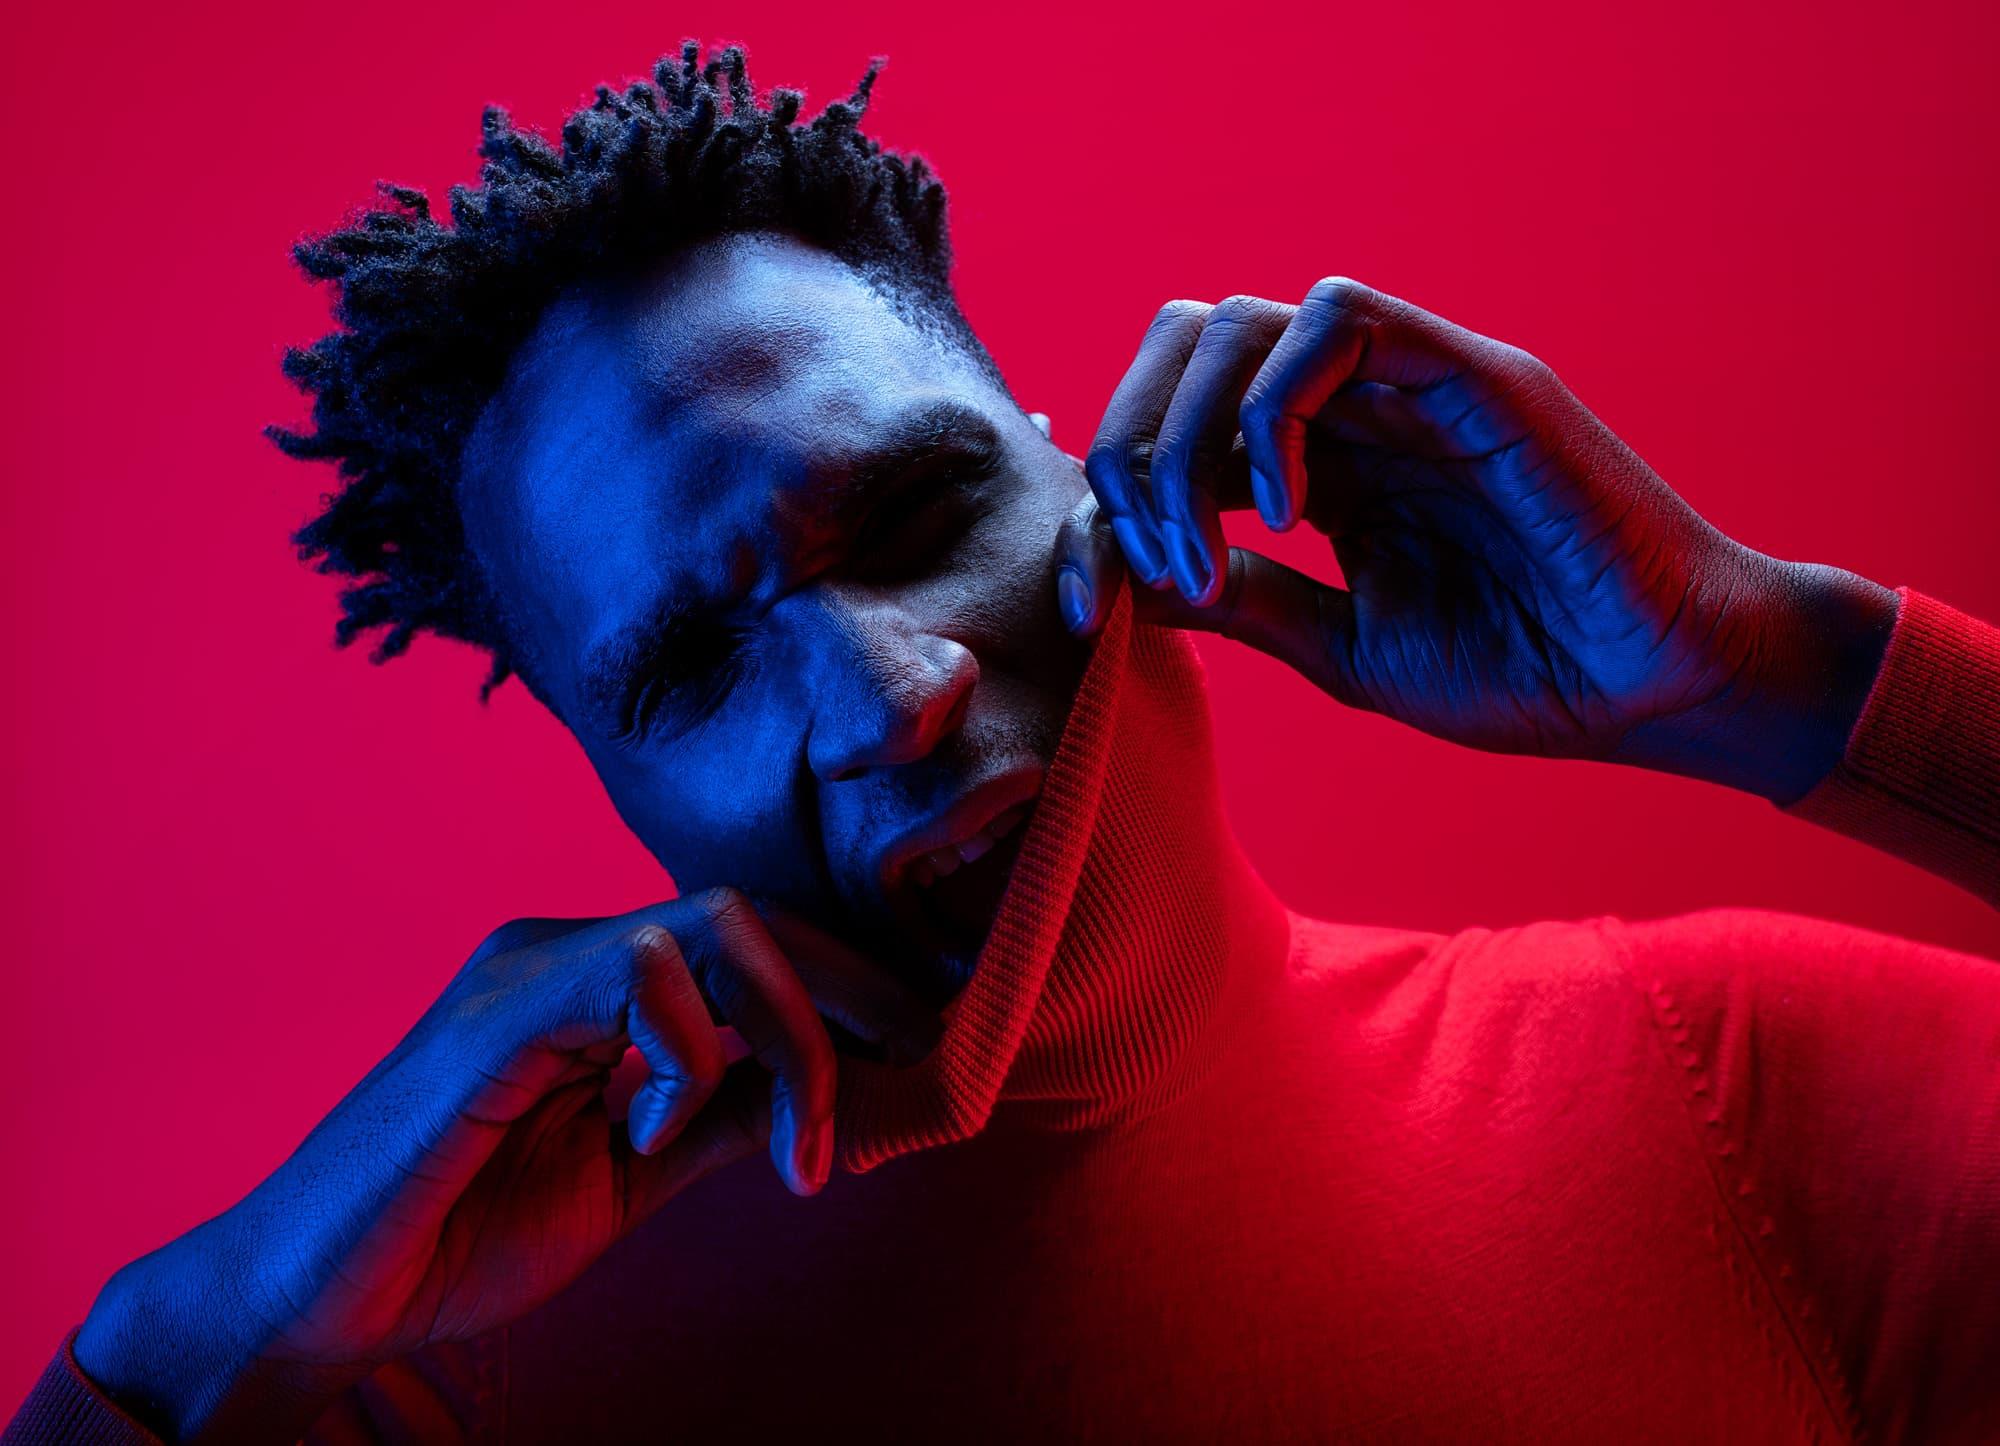 webseite-HolgerAltgeld-Pascal-Nkongo-portraits-026